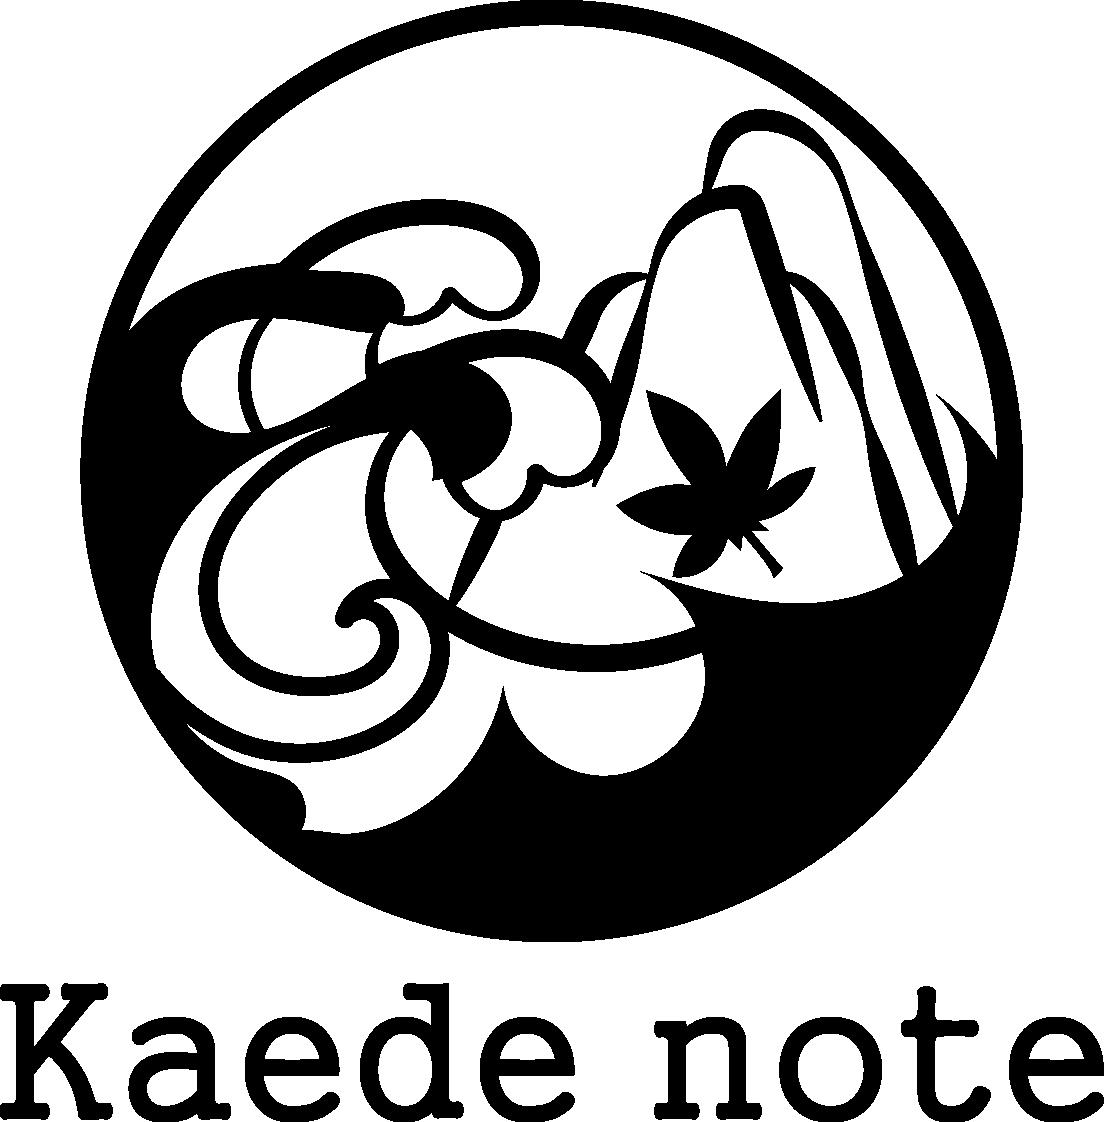 Kaede note